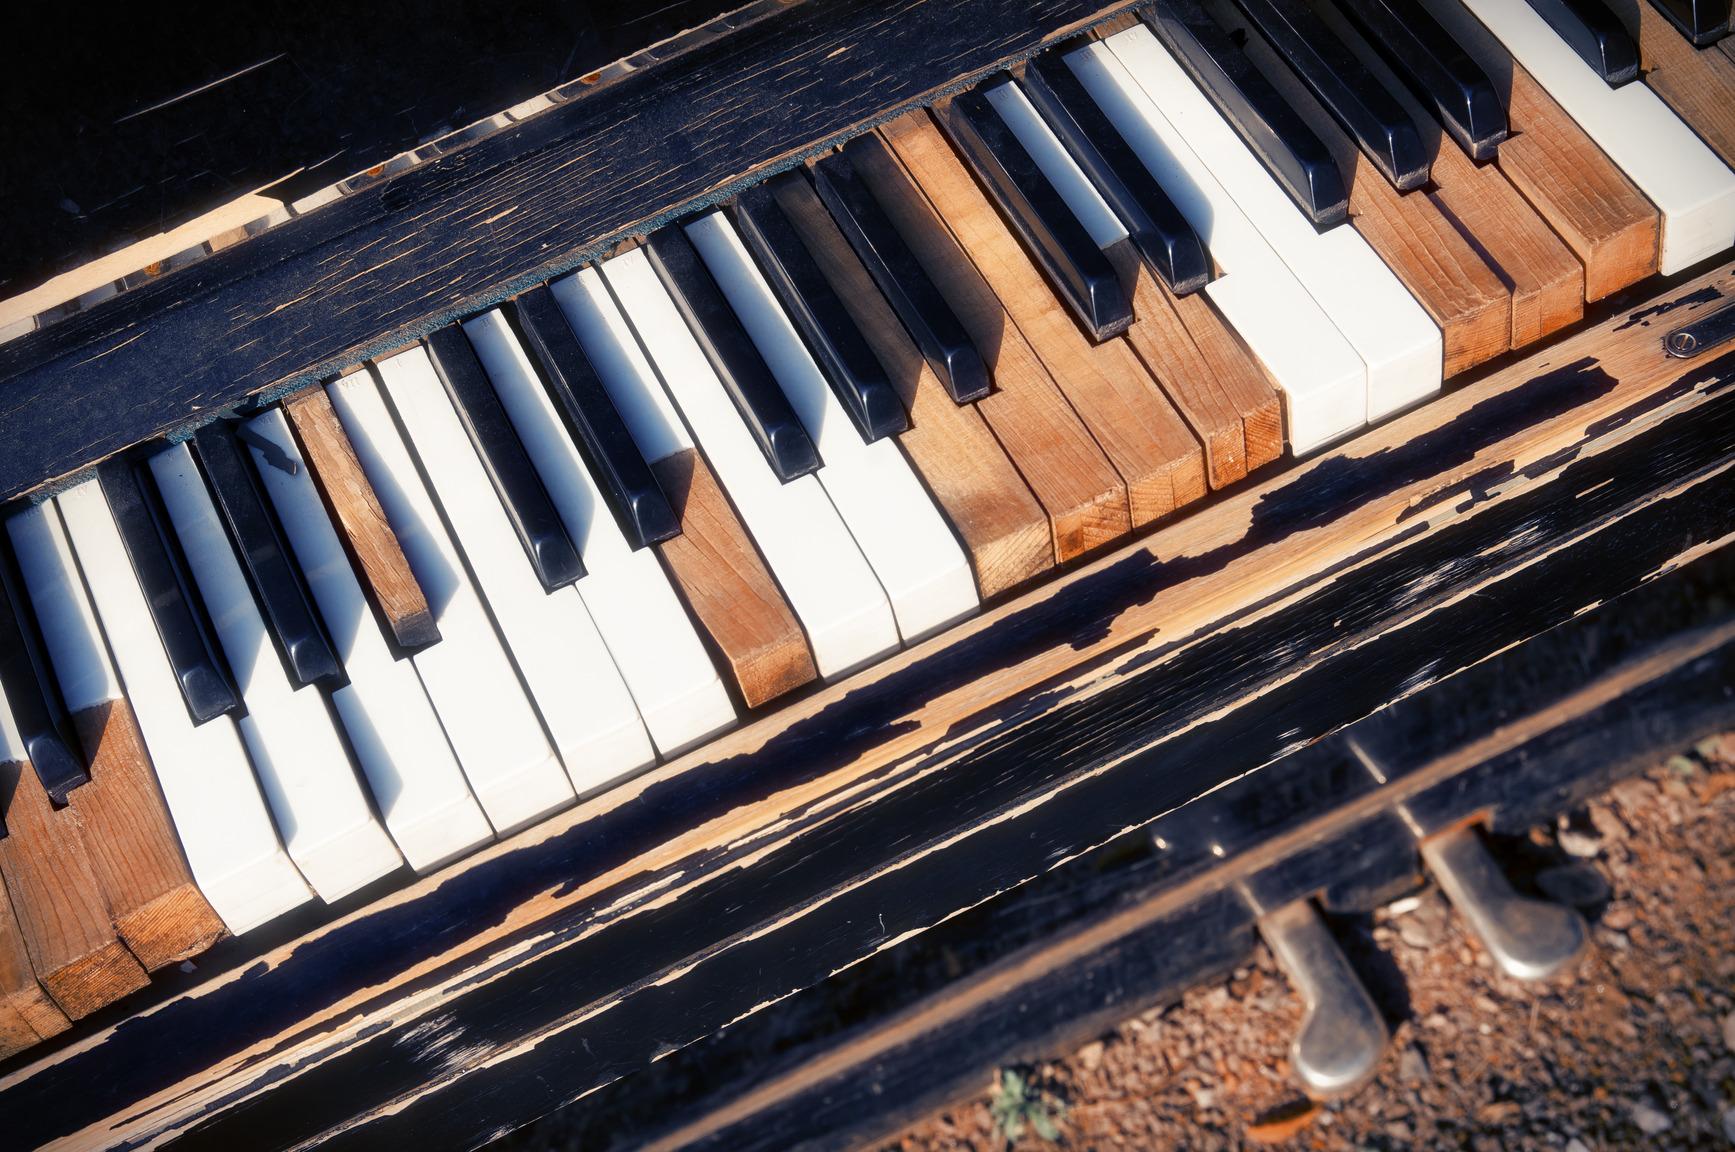 photodune-5032390-old-piano-m